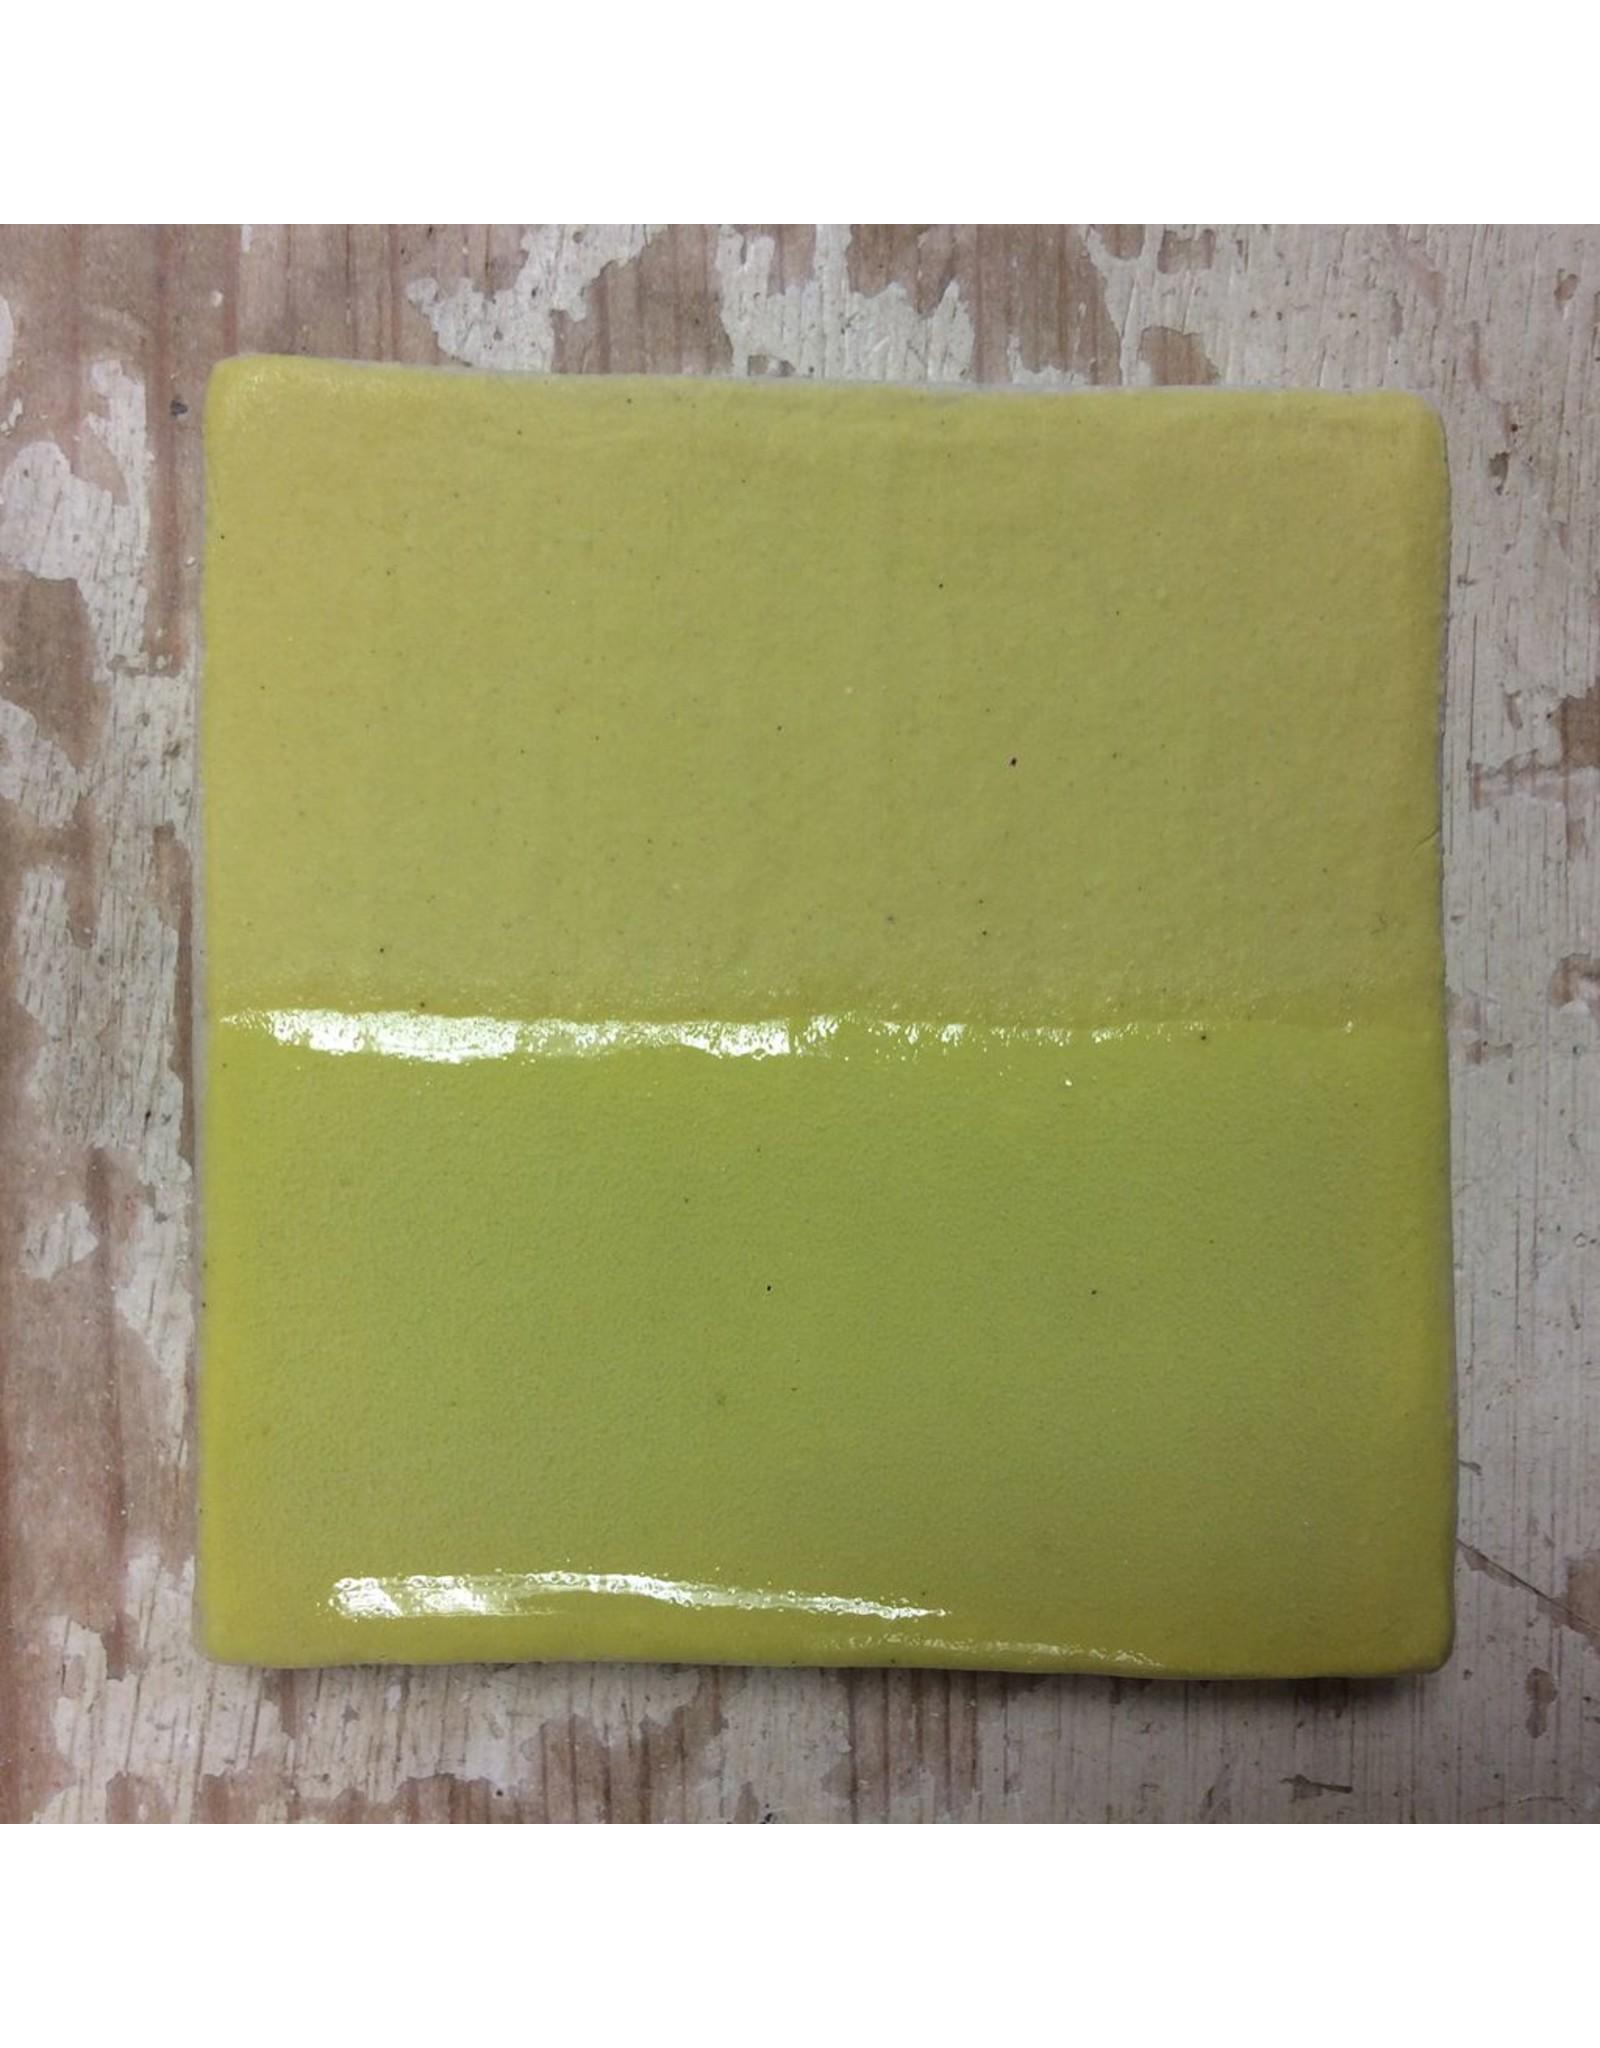 Scarva Pompadour Yellow Decorating Slip 1 litre